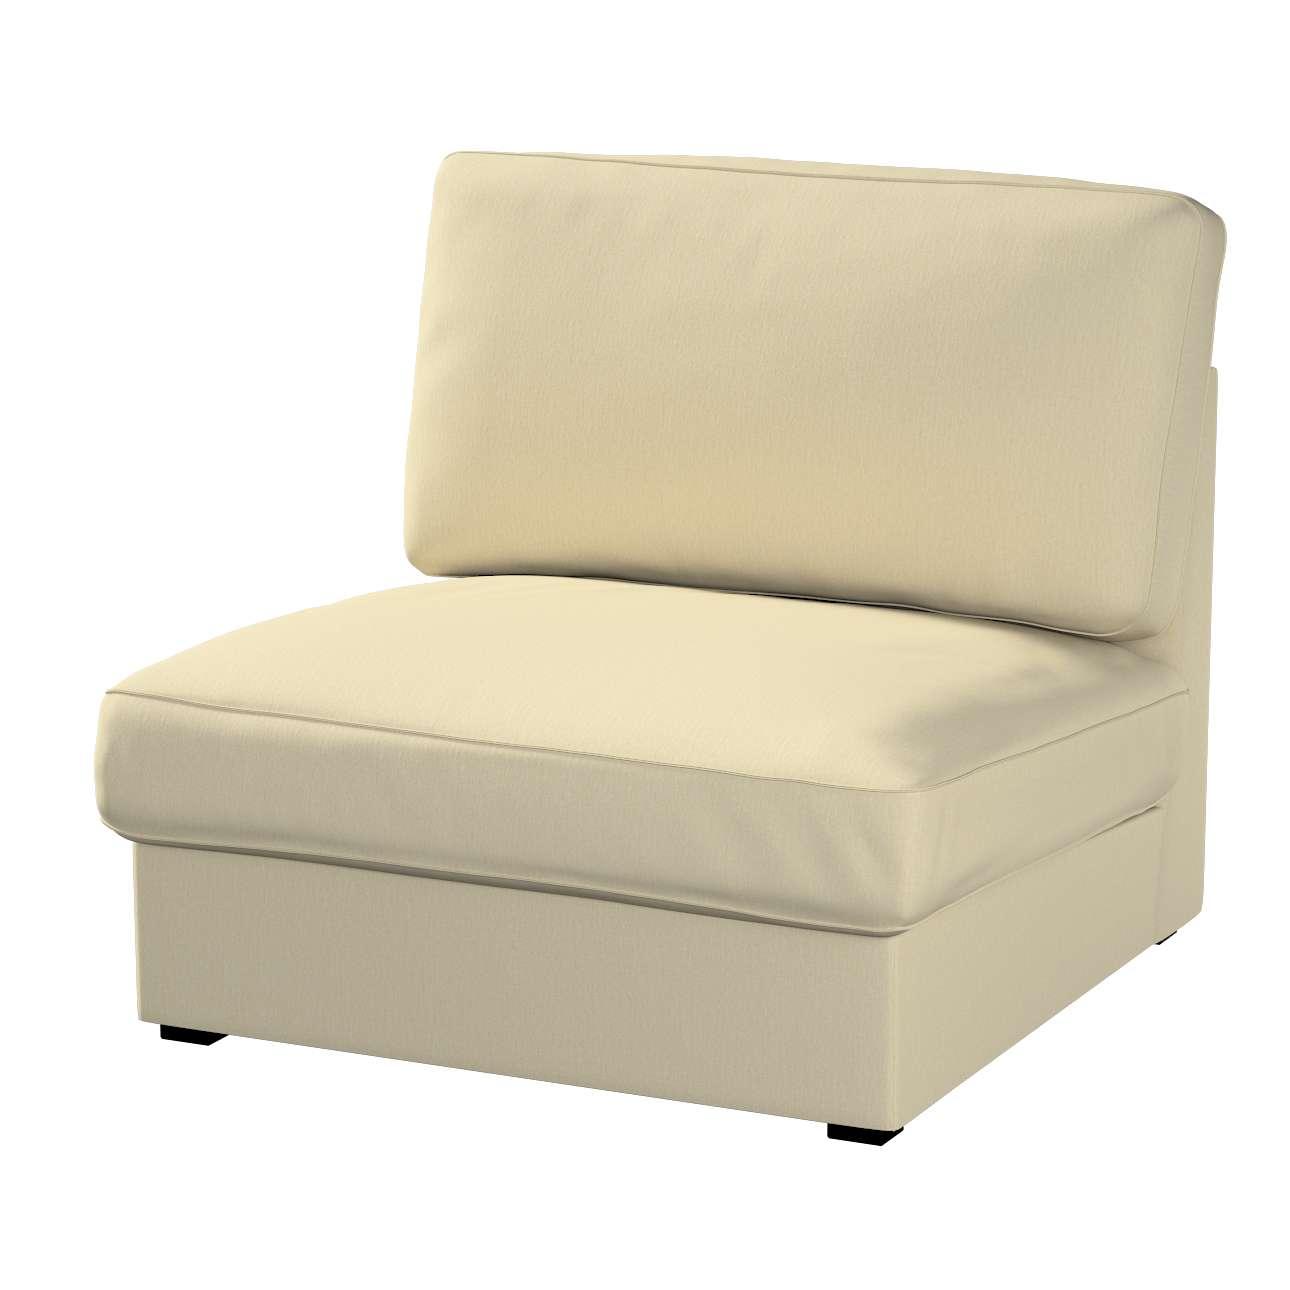 Pokrowiec na fotel Kivik Fotel Kivik w kolekcji Chenille, tkanina: 702-22